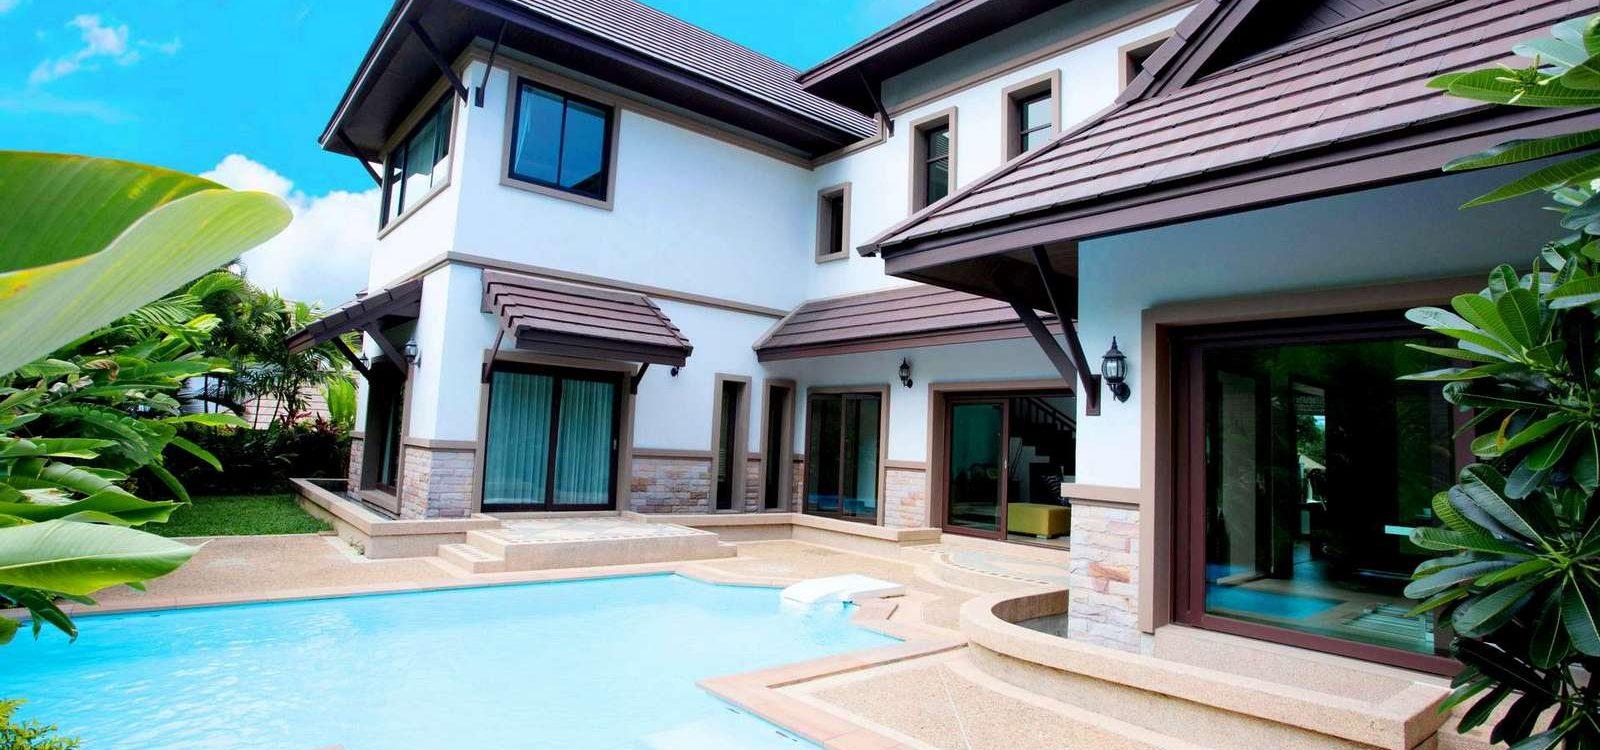 Villa Phuket - OZONE PHUKET